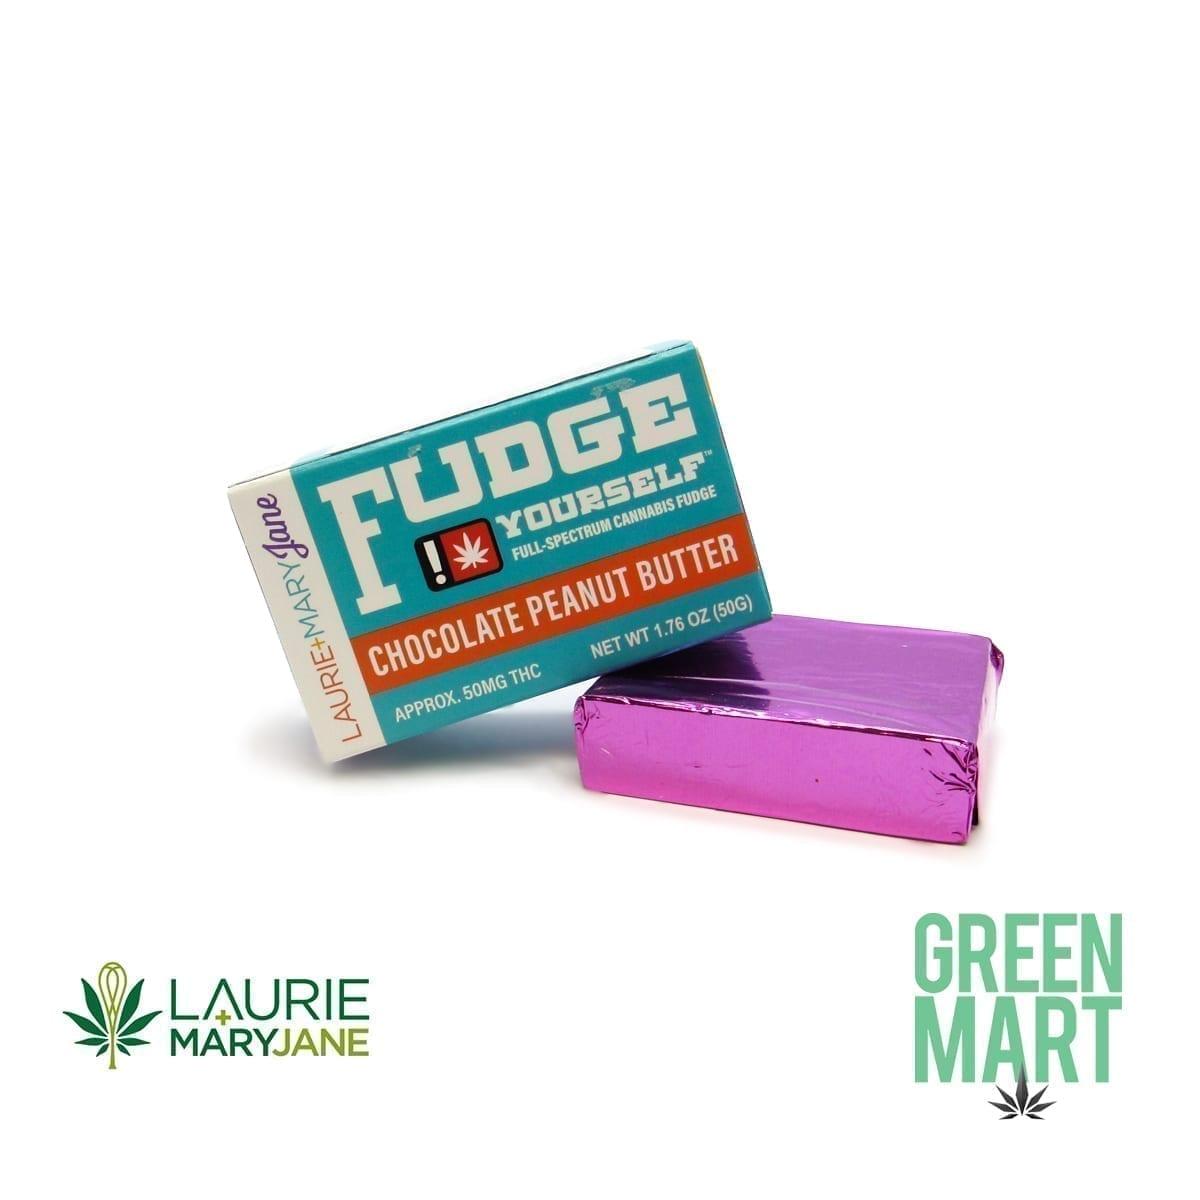 Fudge Yourself - Peanut Butter Fudge